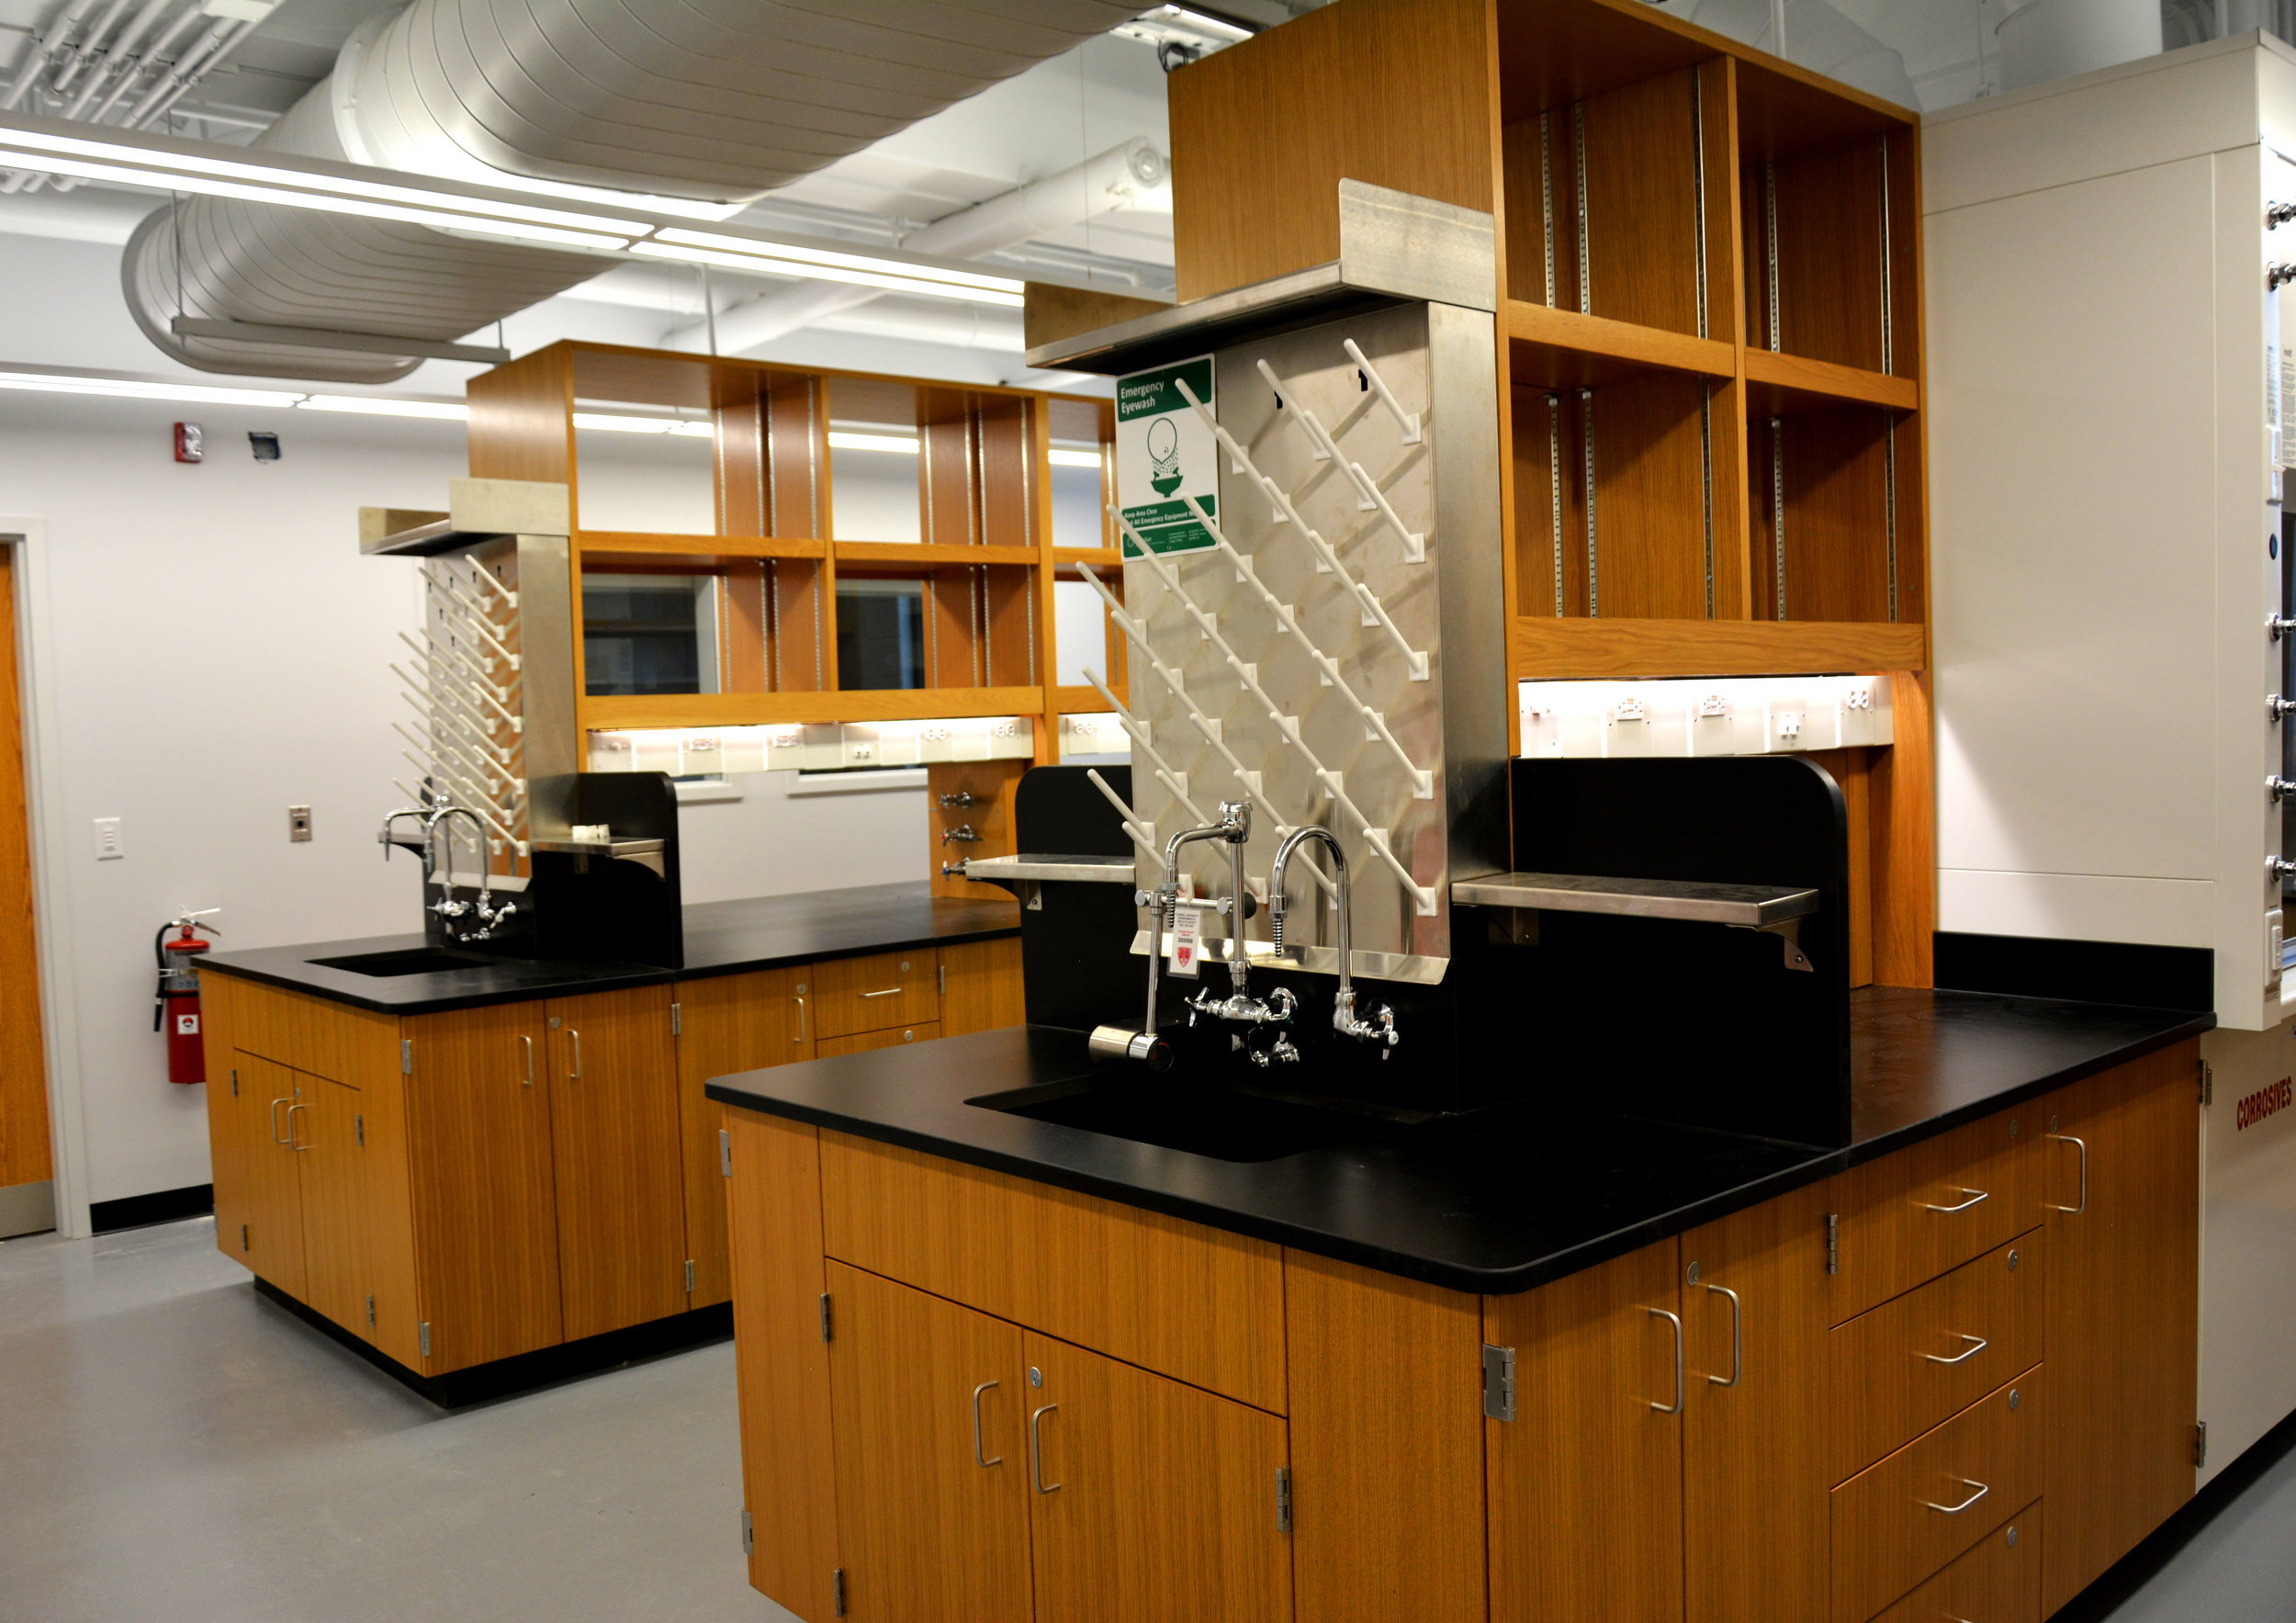 Cornell University Olin Chemistry Lab